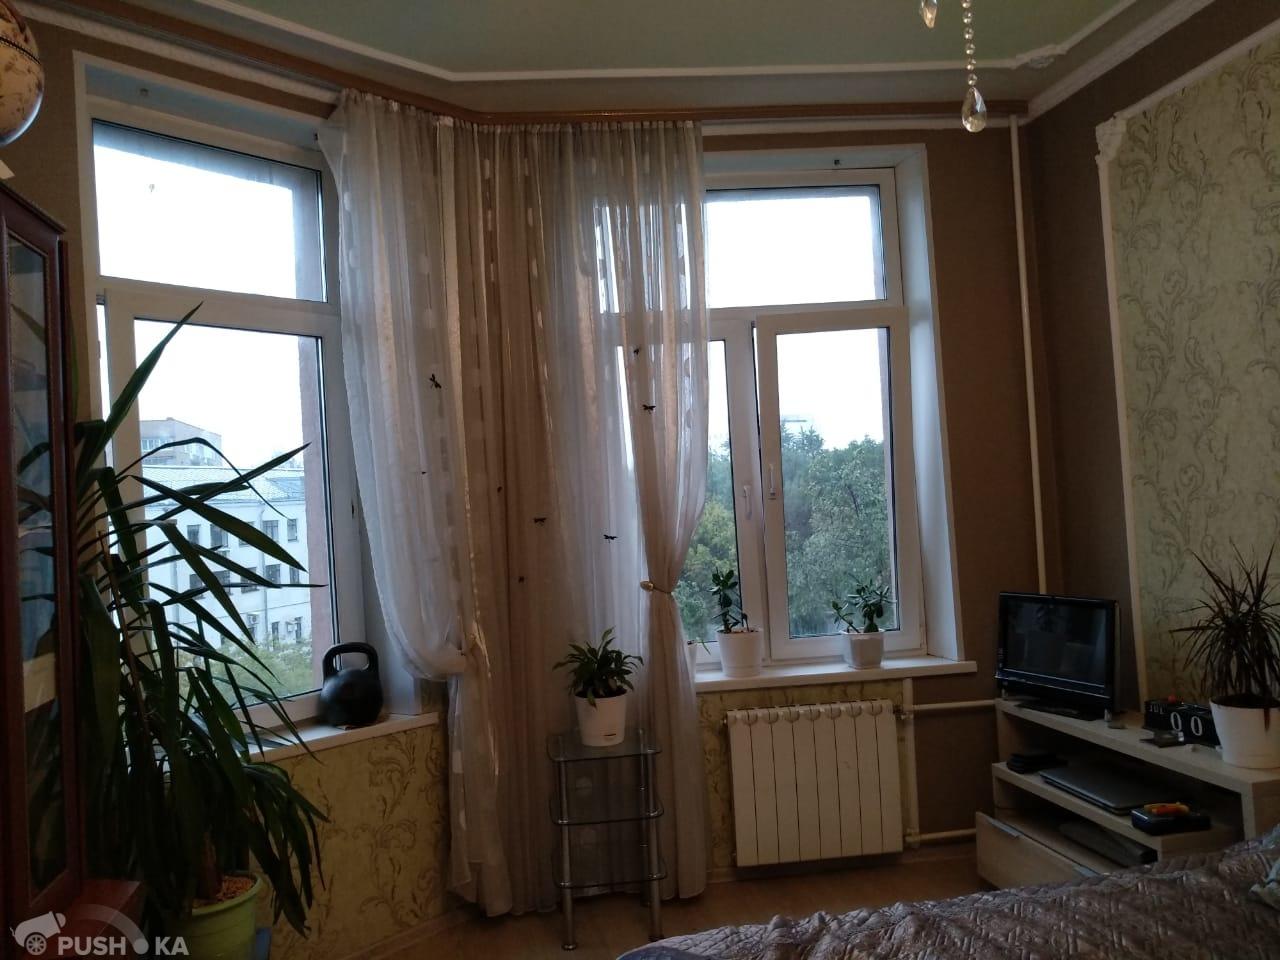 Продаётся 3-комнатная квартира 96.0 кв.м. этаж 6/7 за 111 000 000 руб